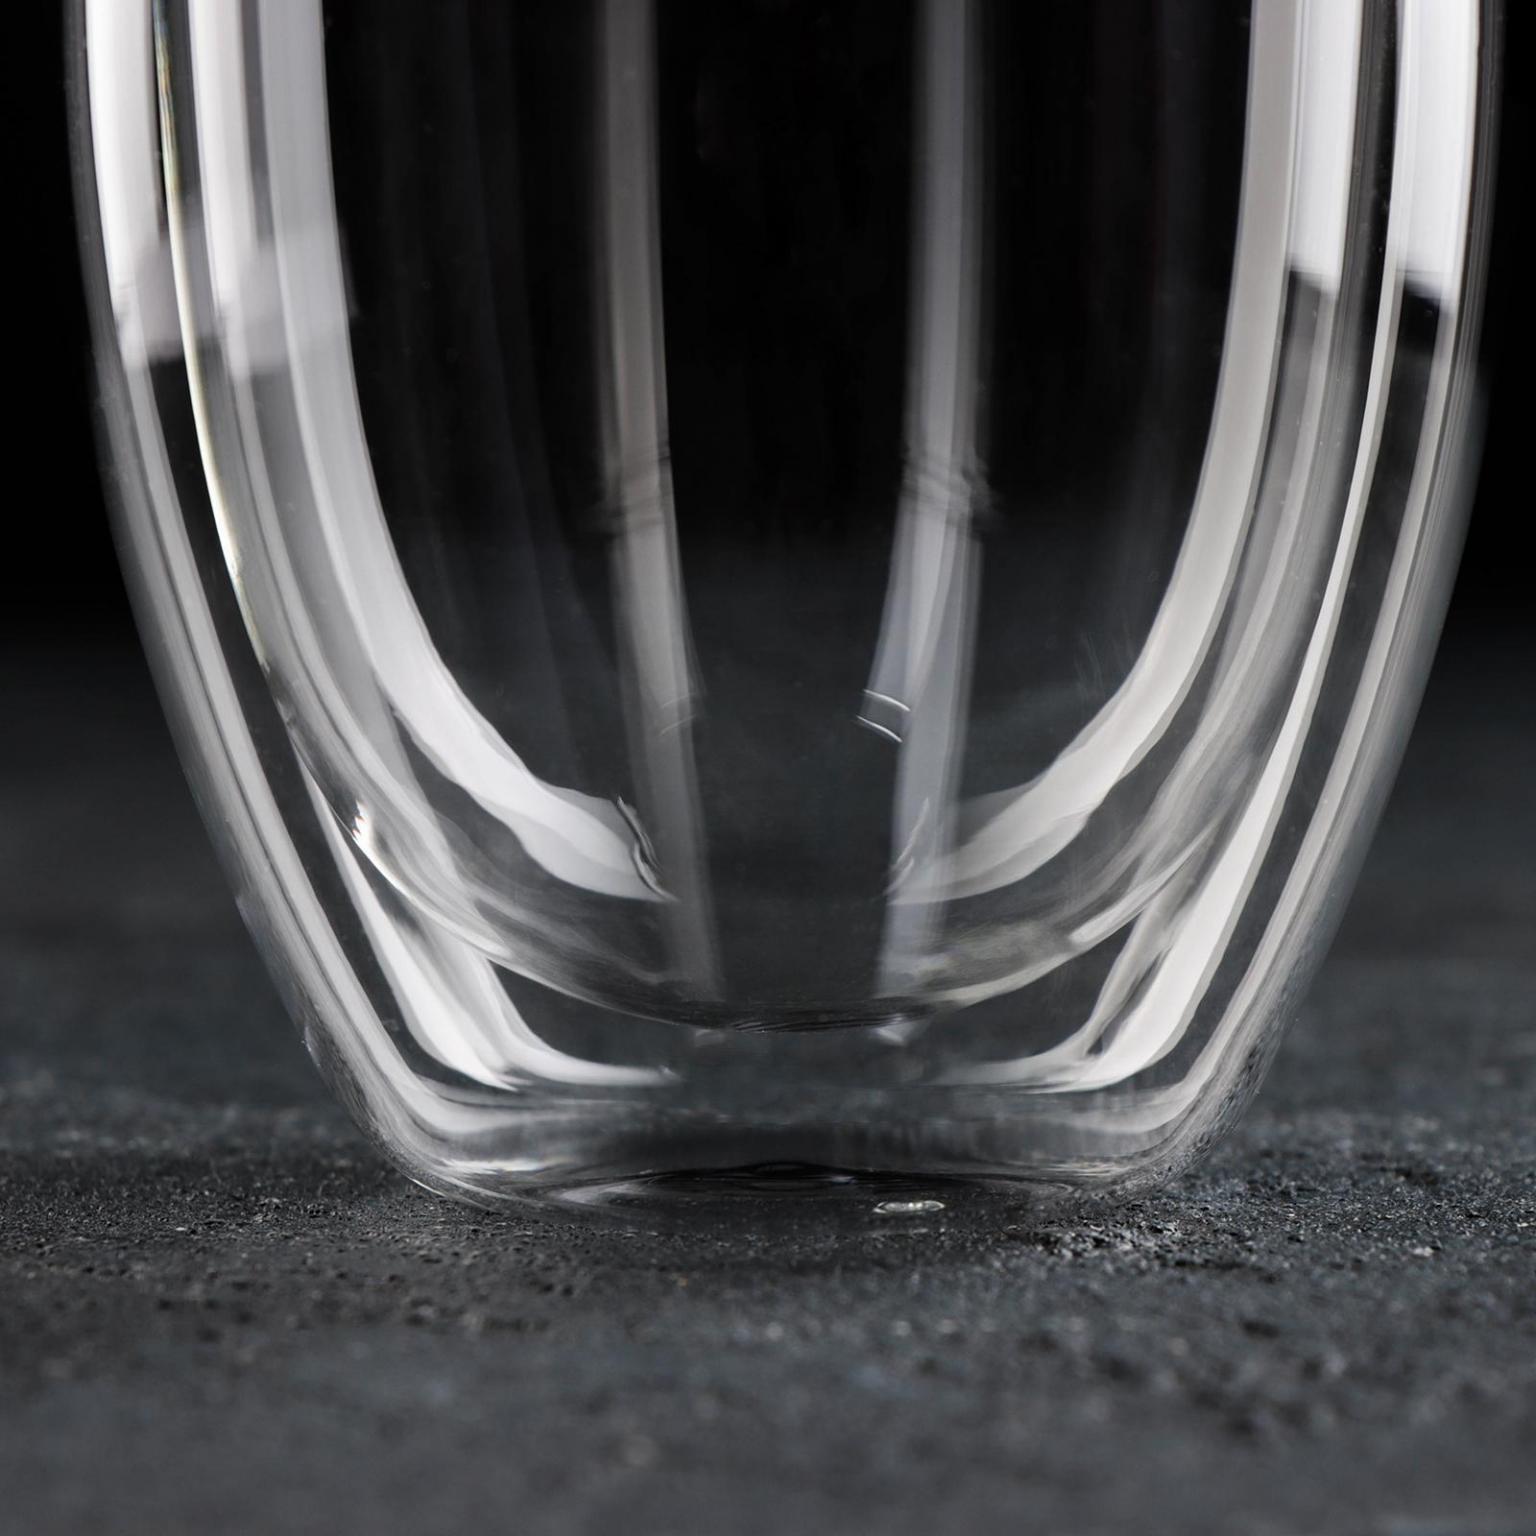 Бокал Олд фэшн, 350 мл, стеклянный, с двойными стенками